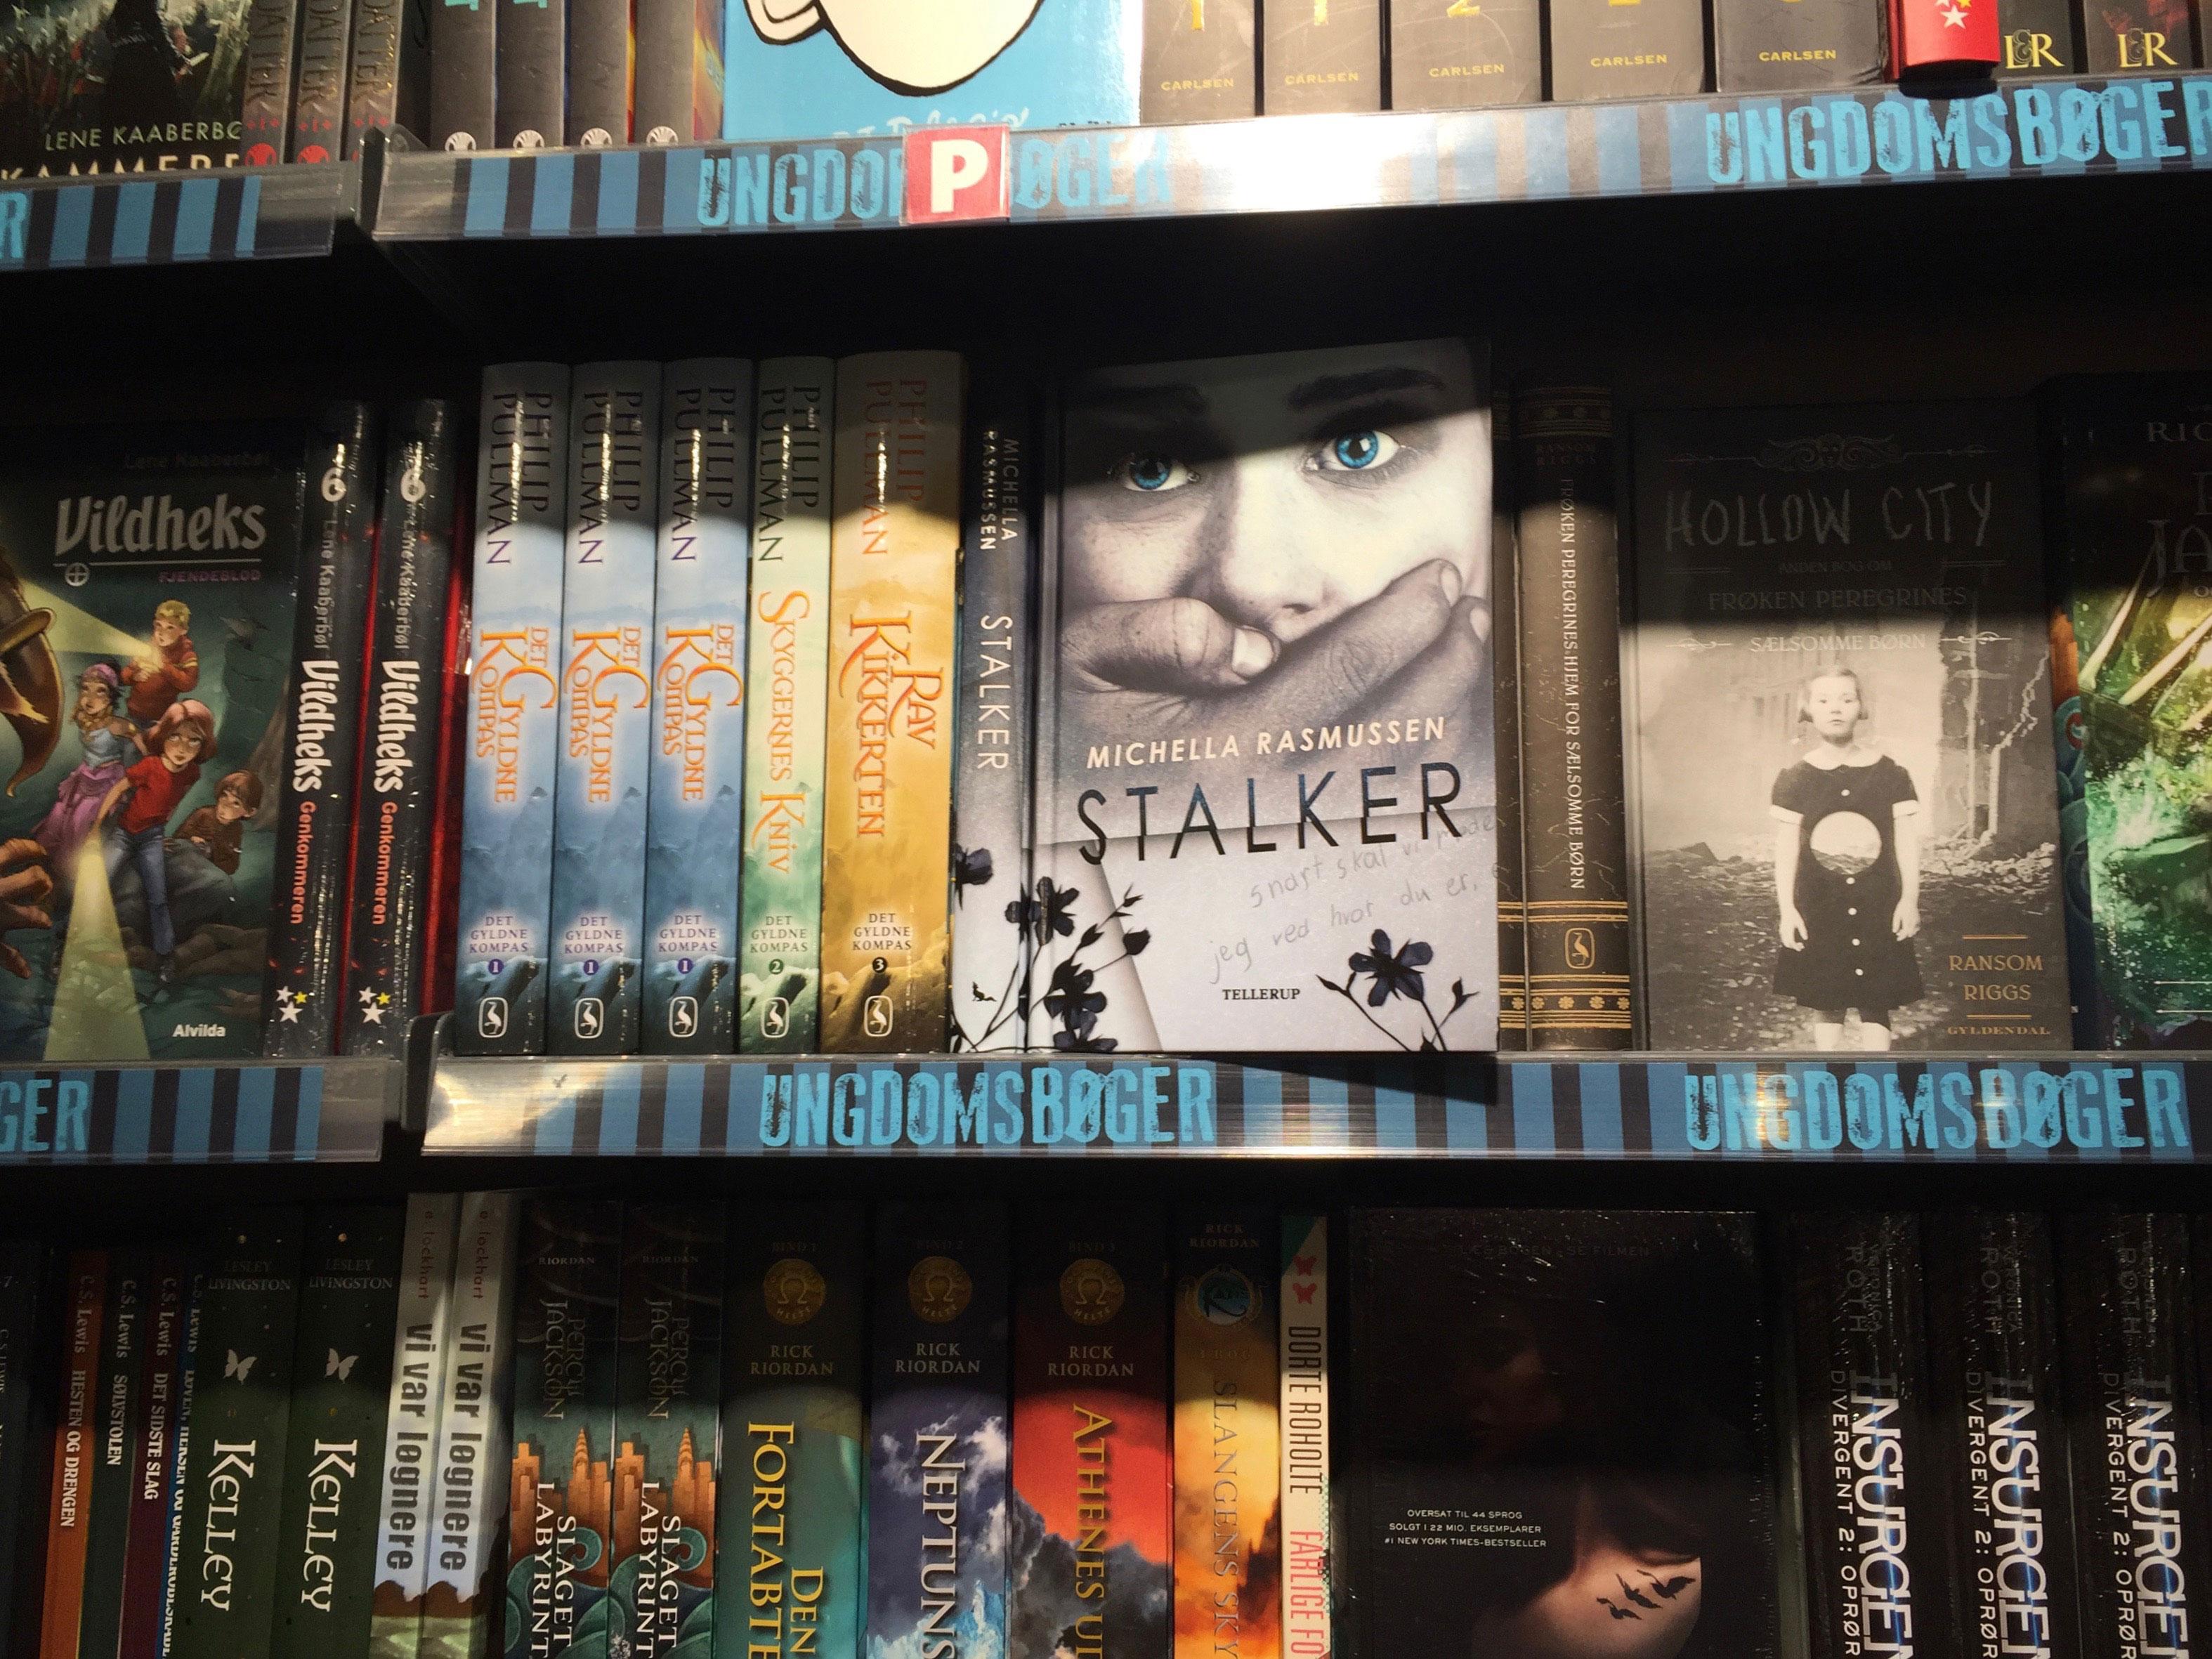 Stalker i boghandleren